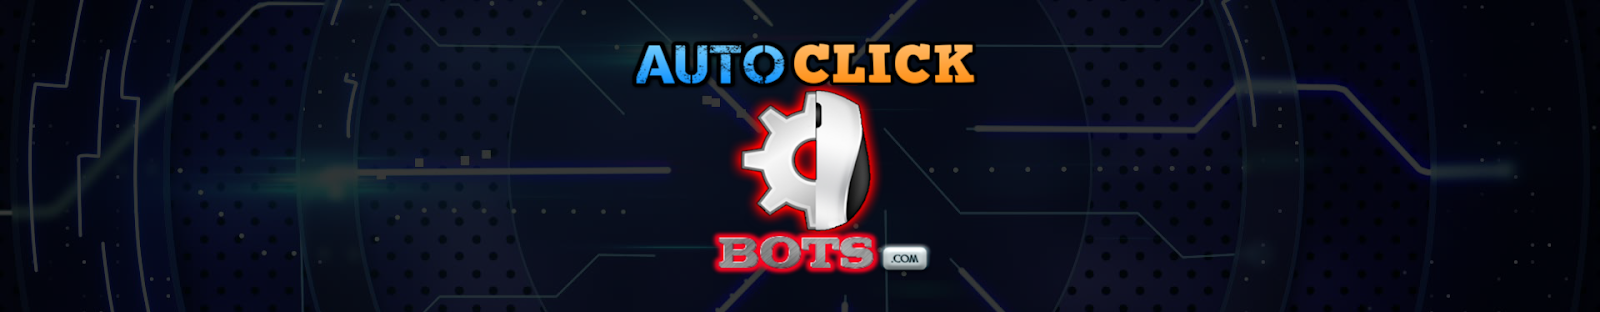 AutoClickBots: PVBot V2 8 - Update Demo - Chrome